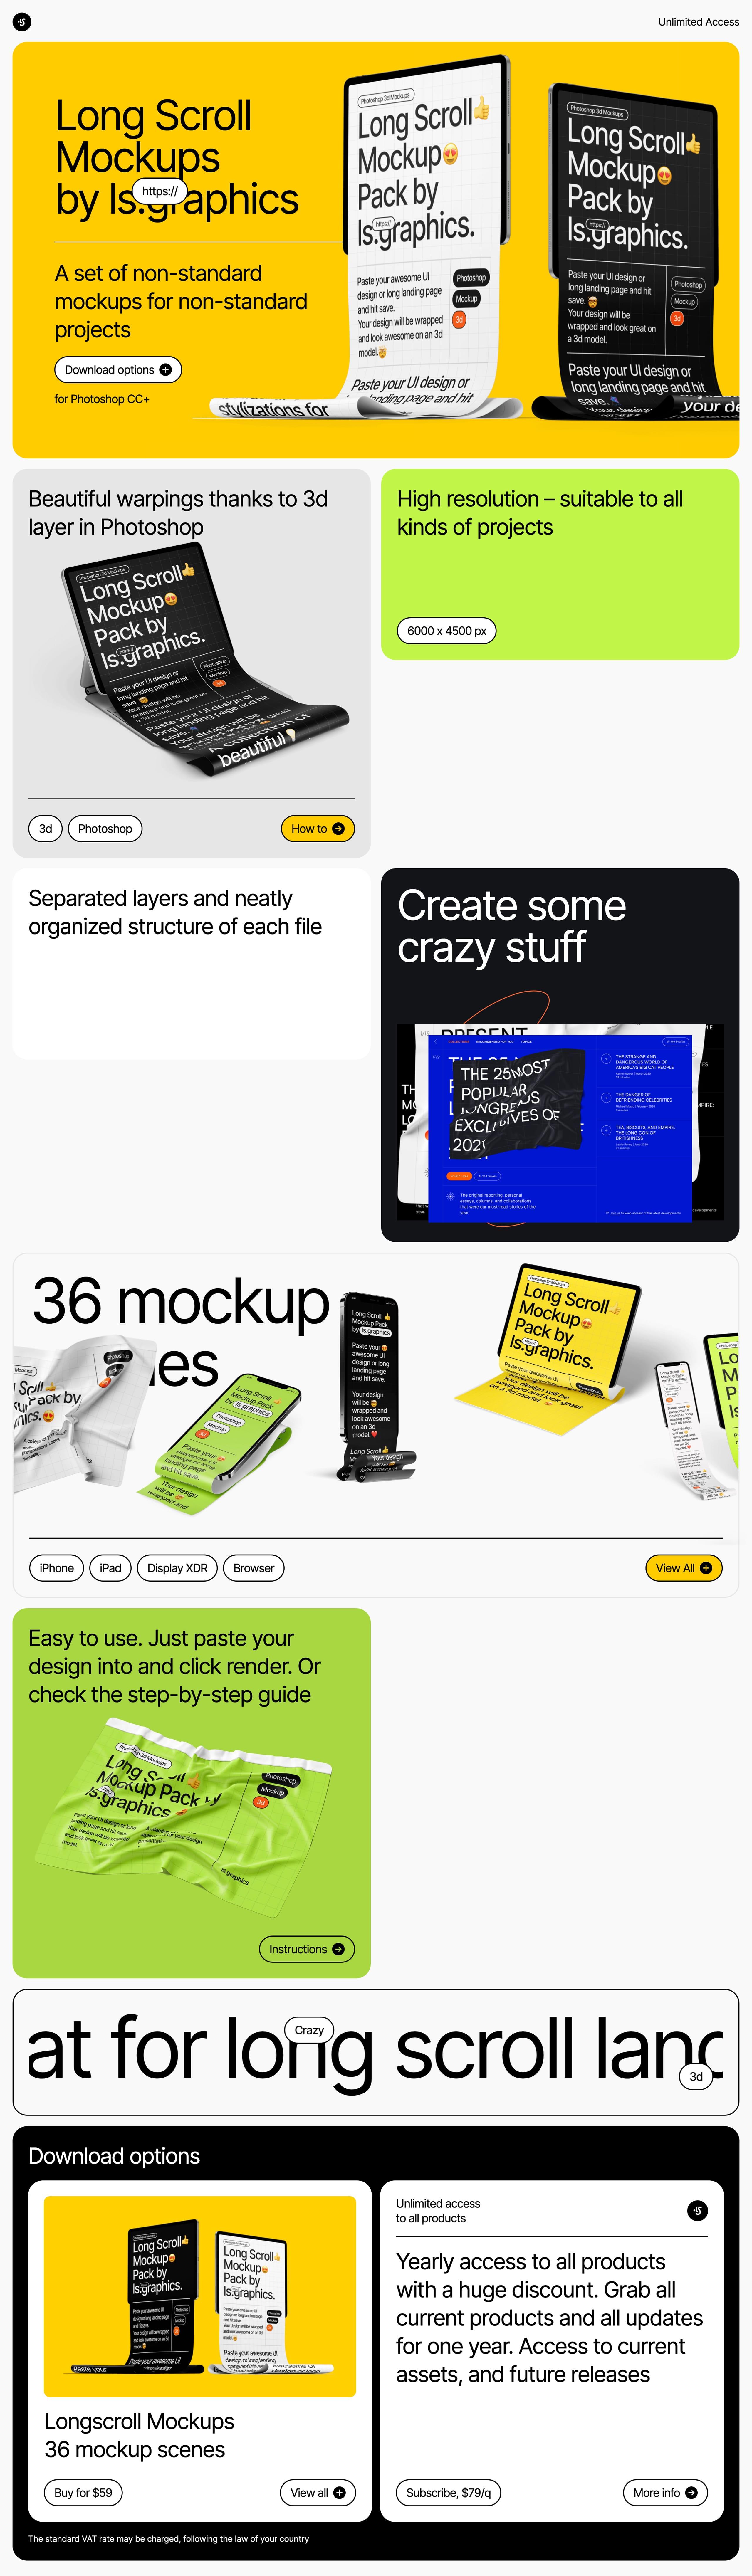 Long Scroll Mockups Website Screenshot